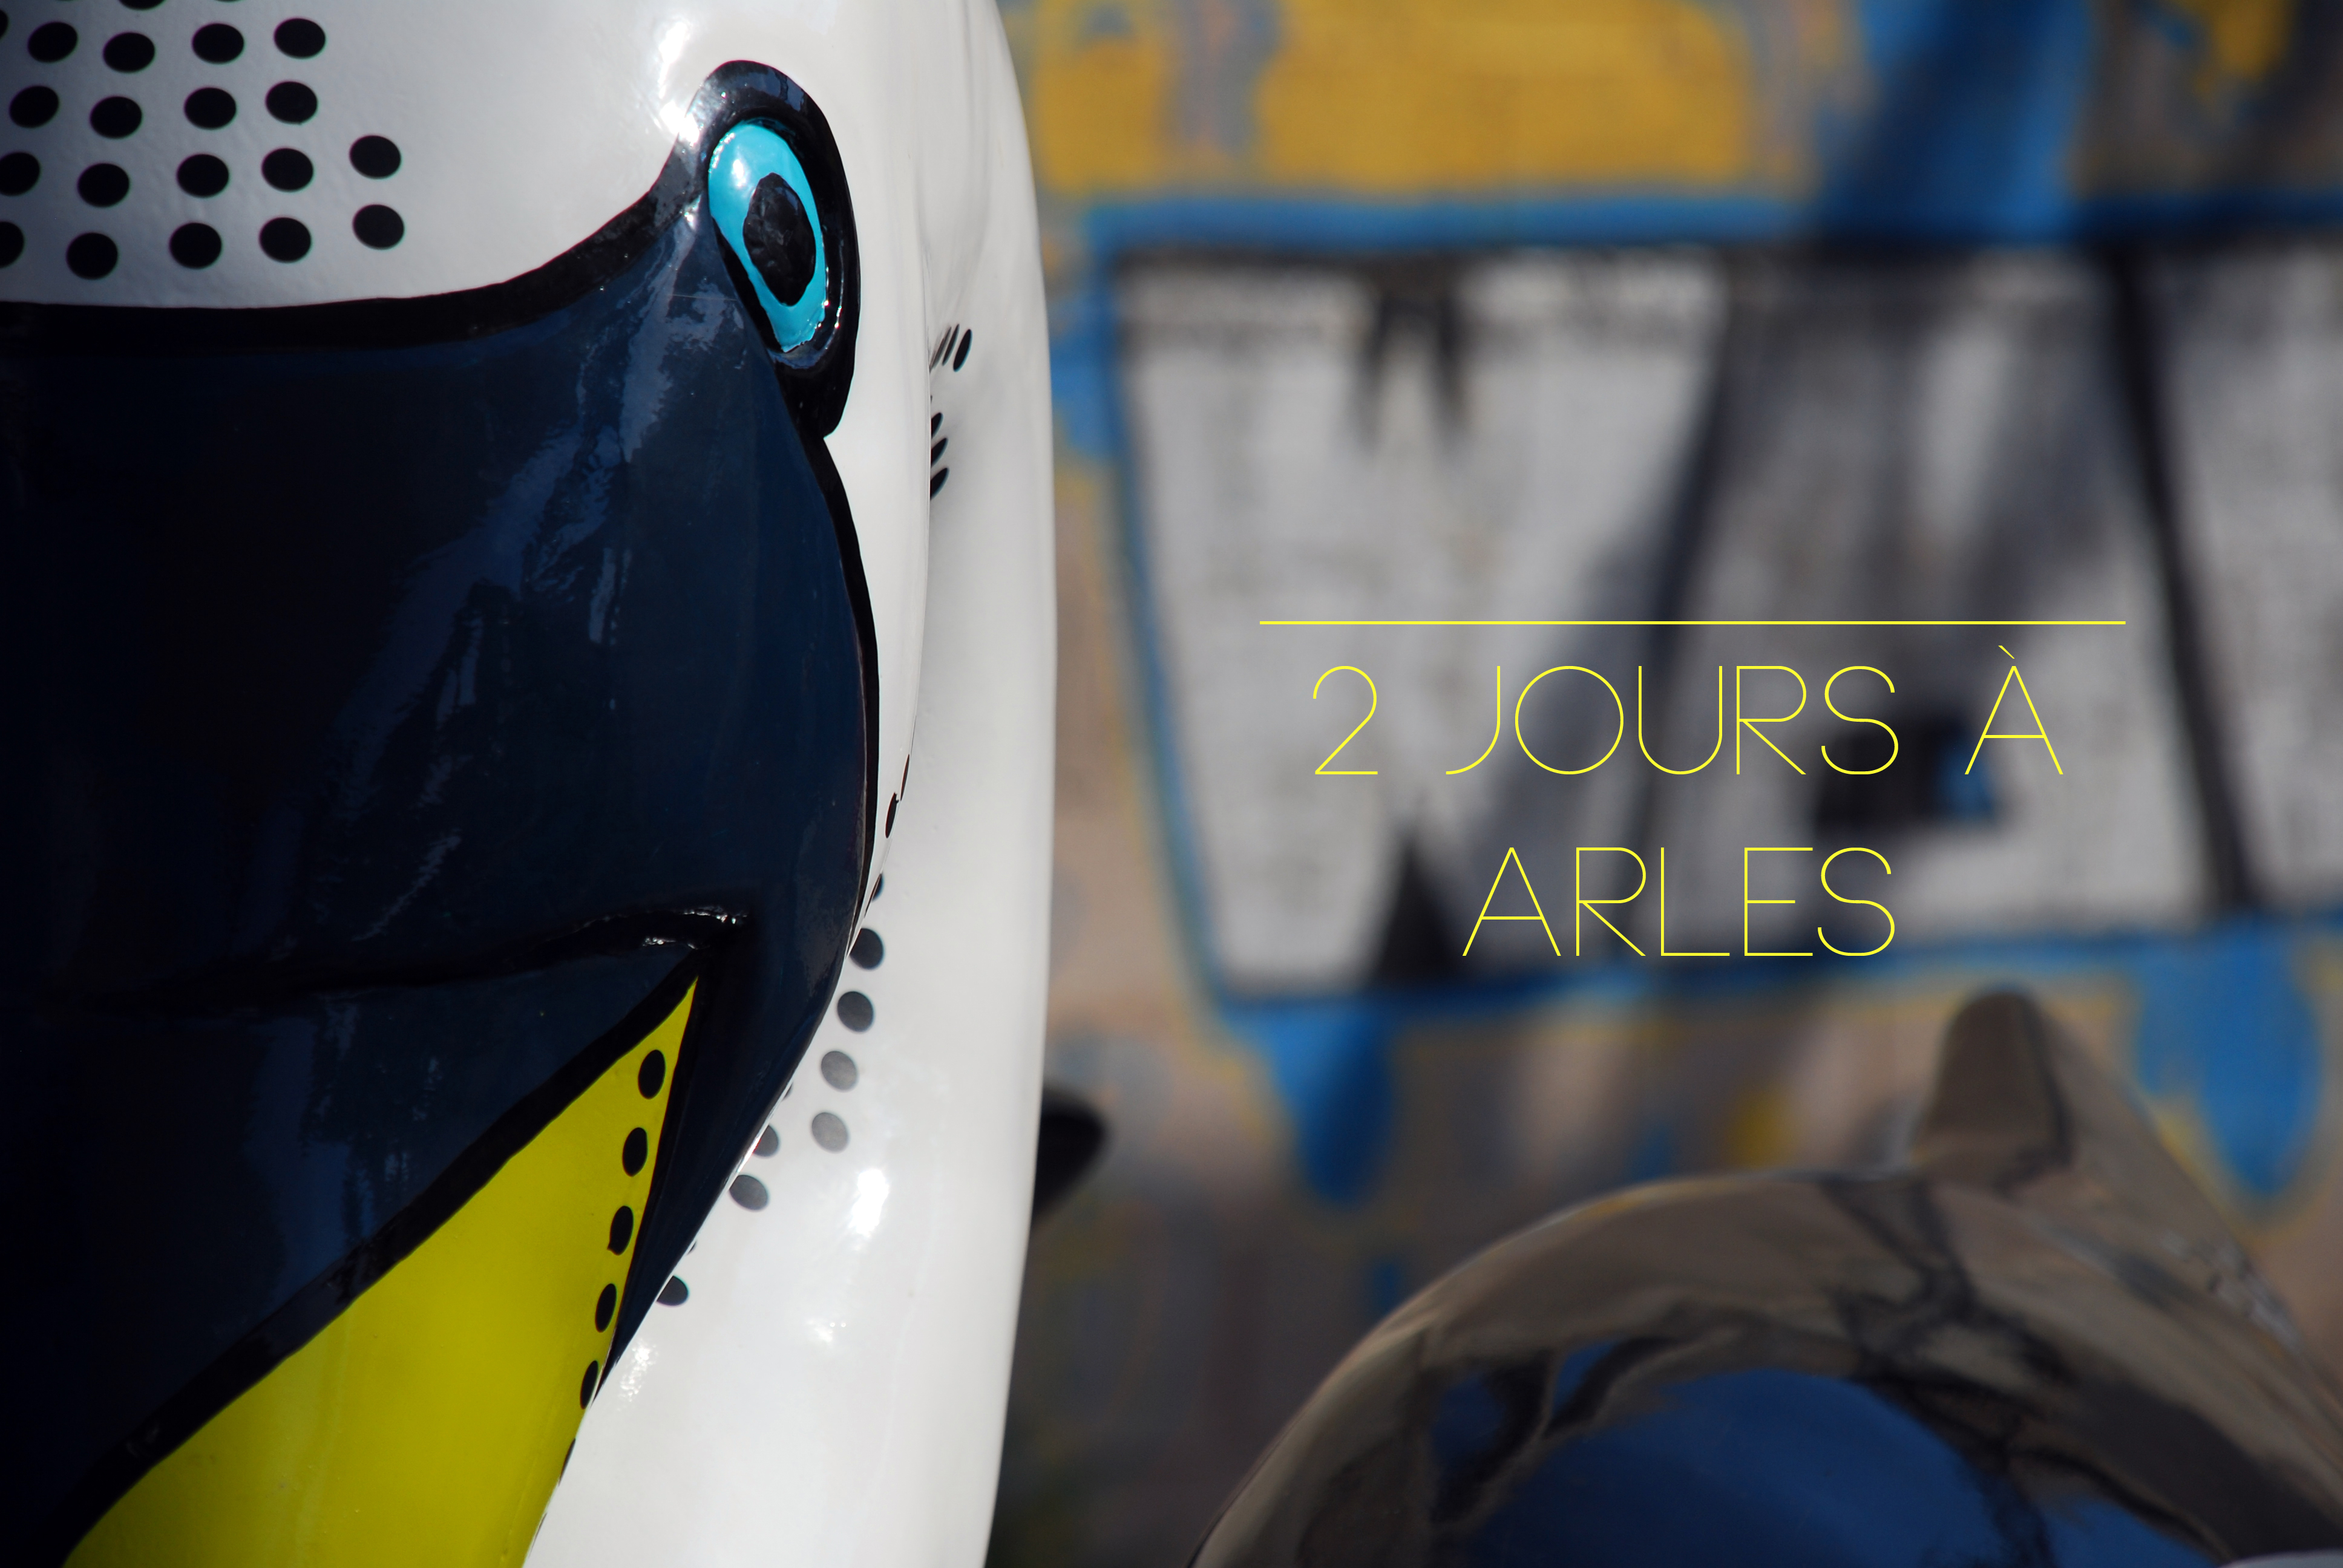 voyage-arles-rencontres-photographiques-2013-by-le-polyedre_visuel